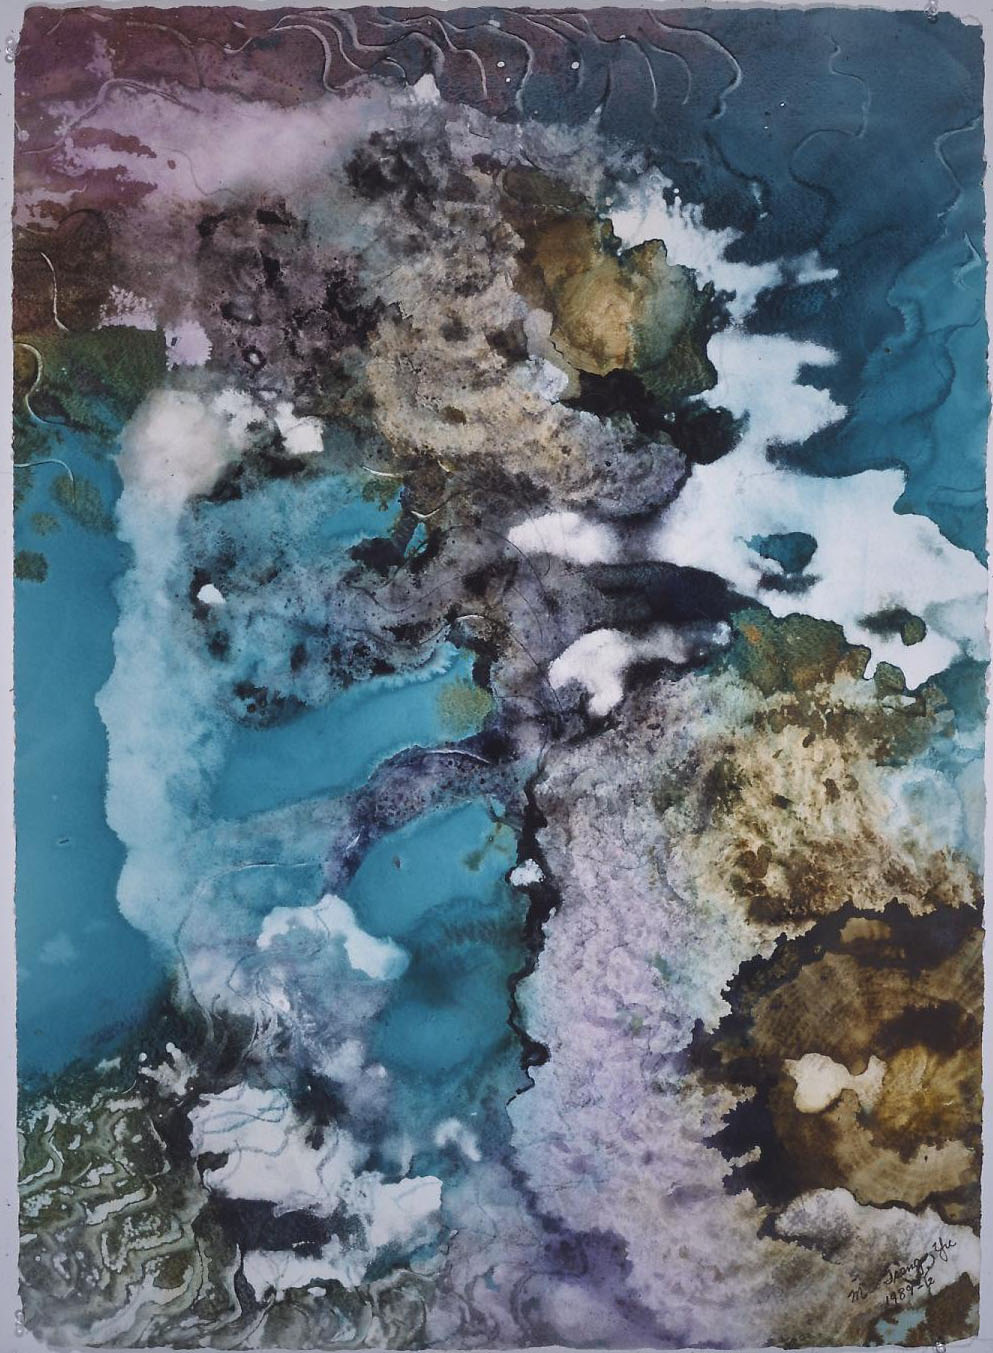 """Sunken Treasure"" 1989, Sunken Treasure Series, acrylic on paper, 42 x 32 in (107 x 81 cm)."